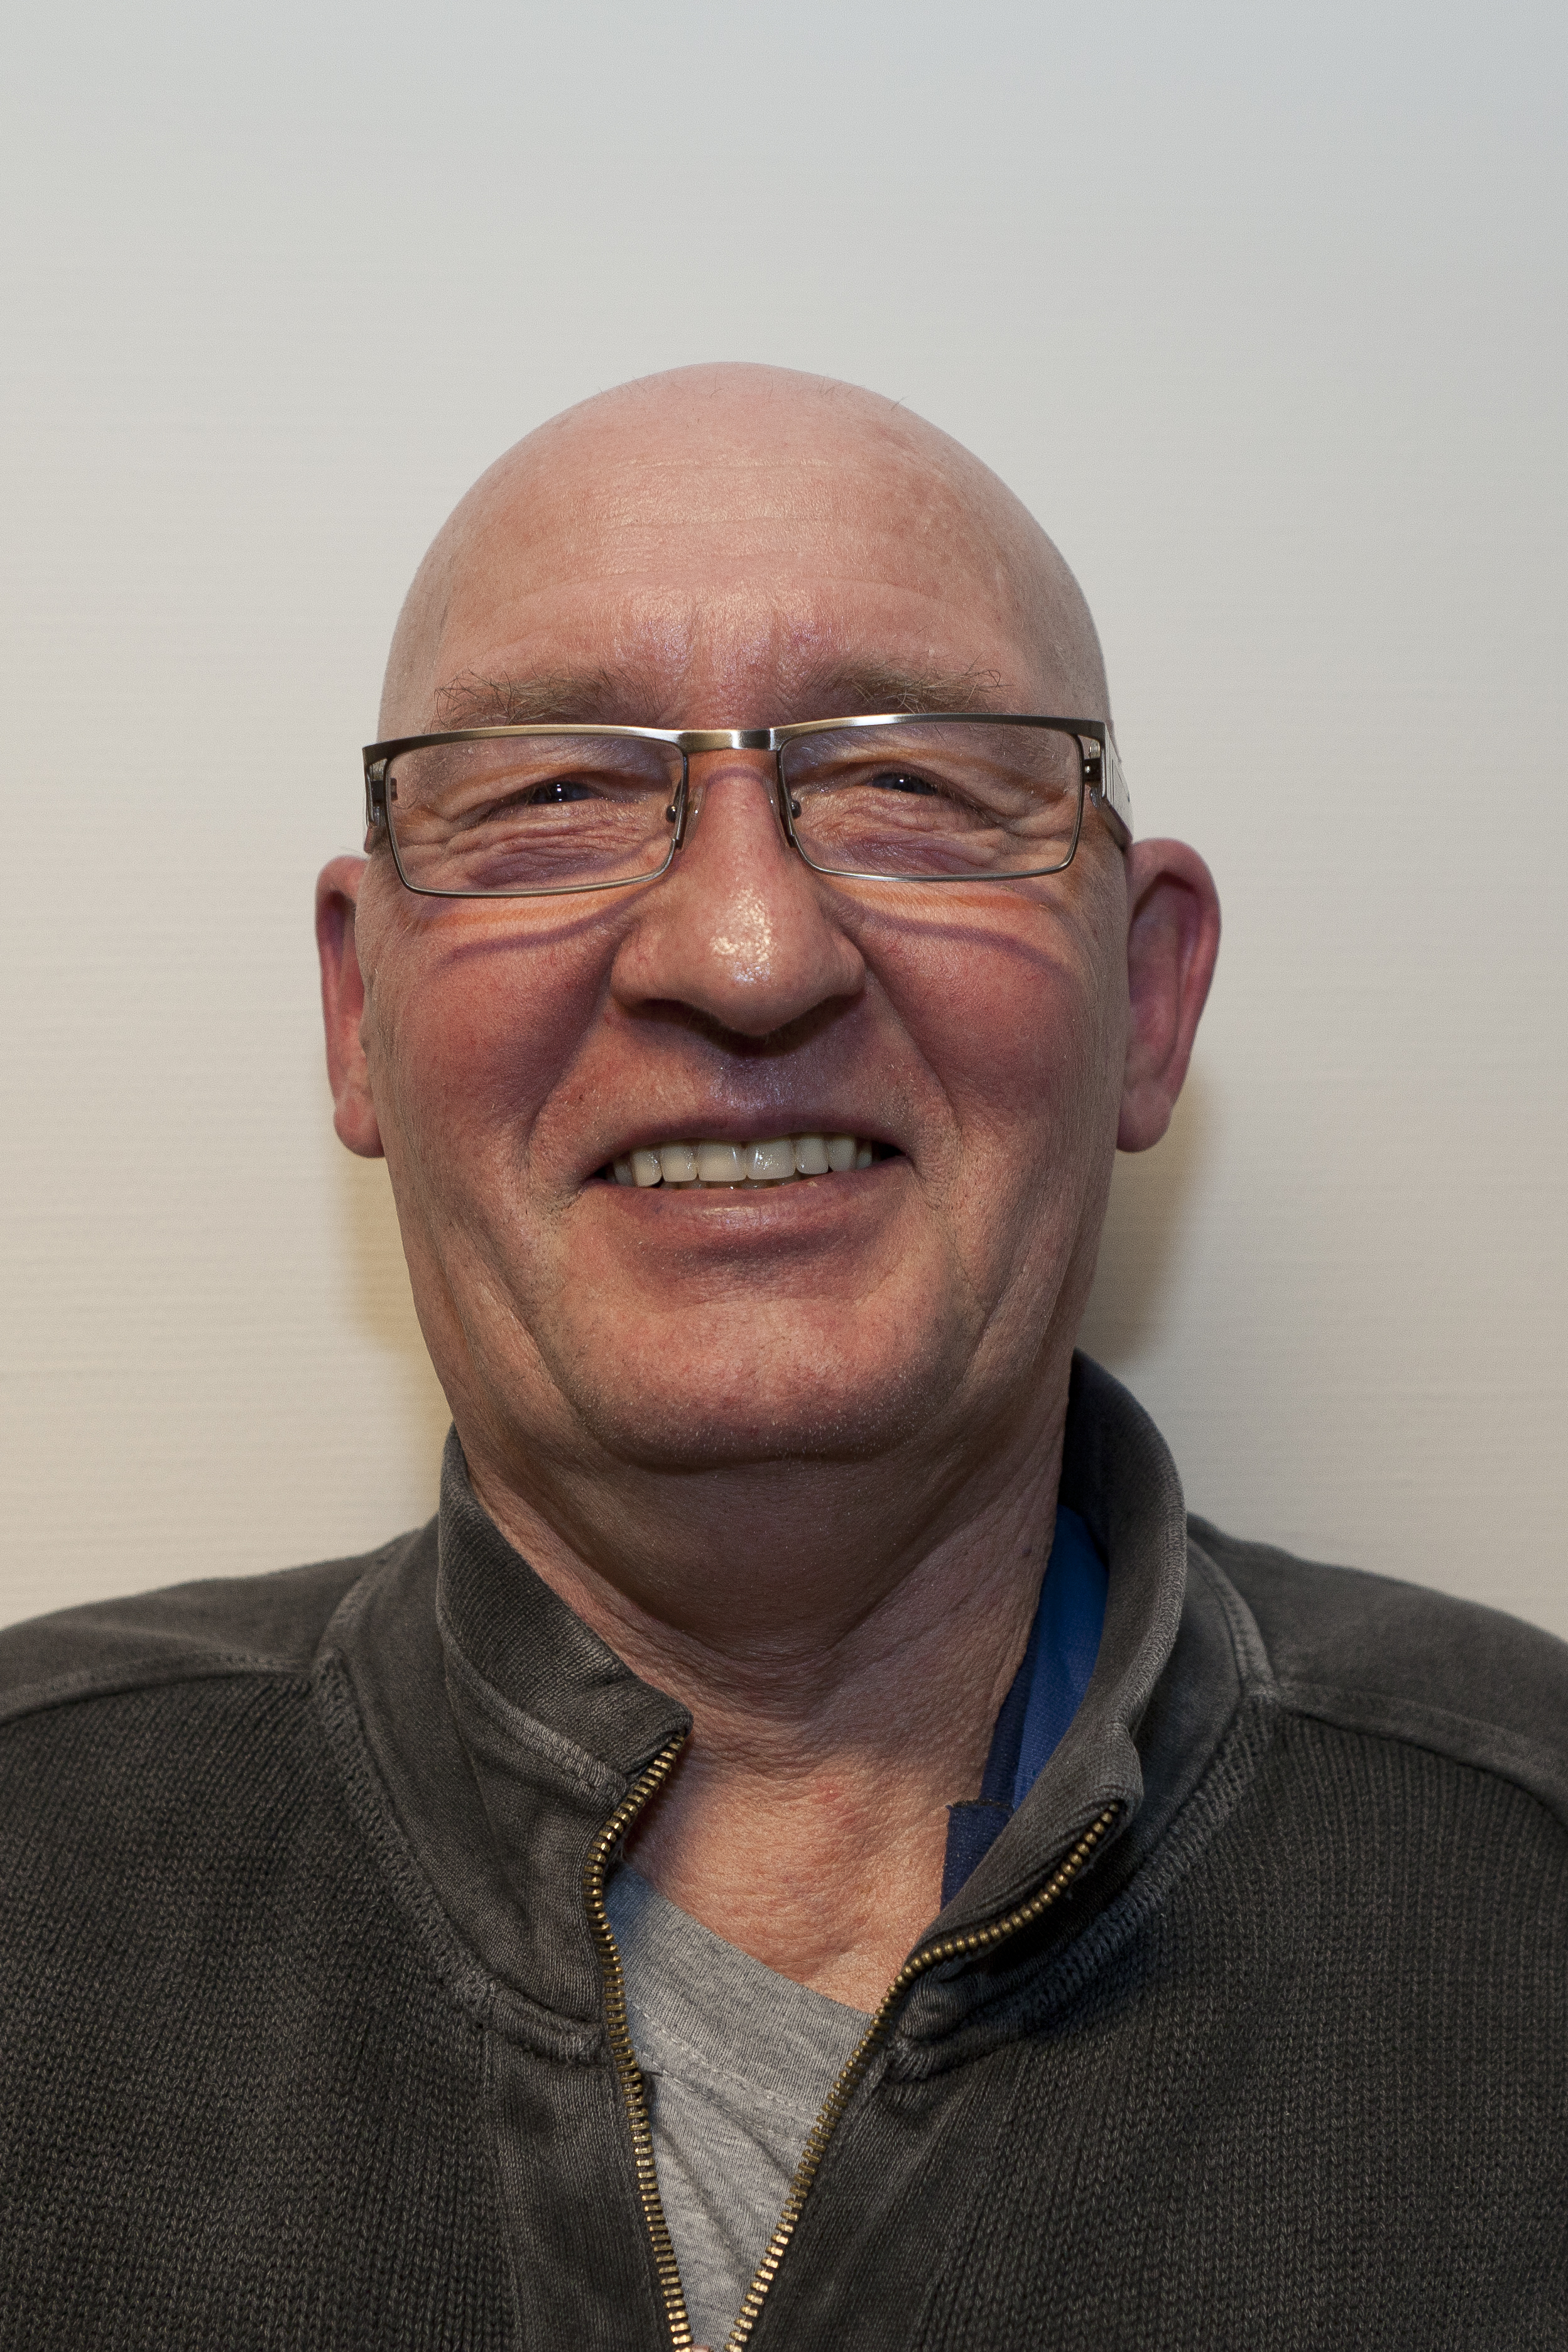 Johan van Baak